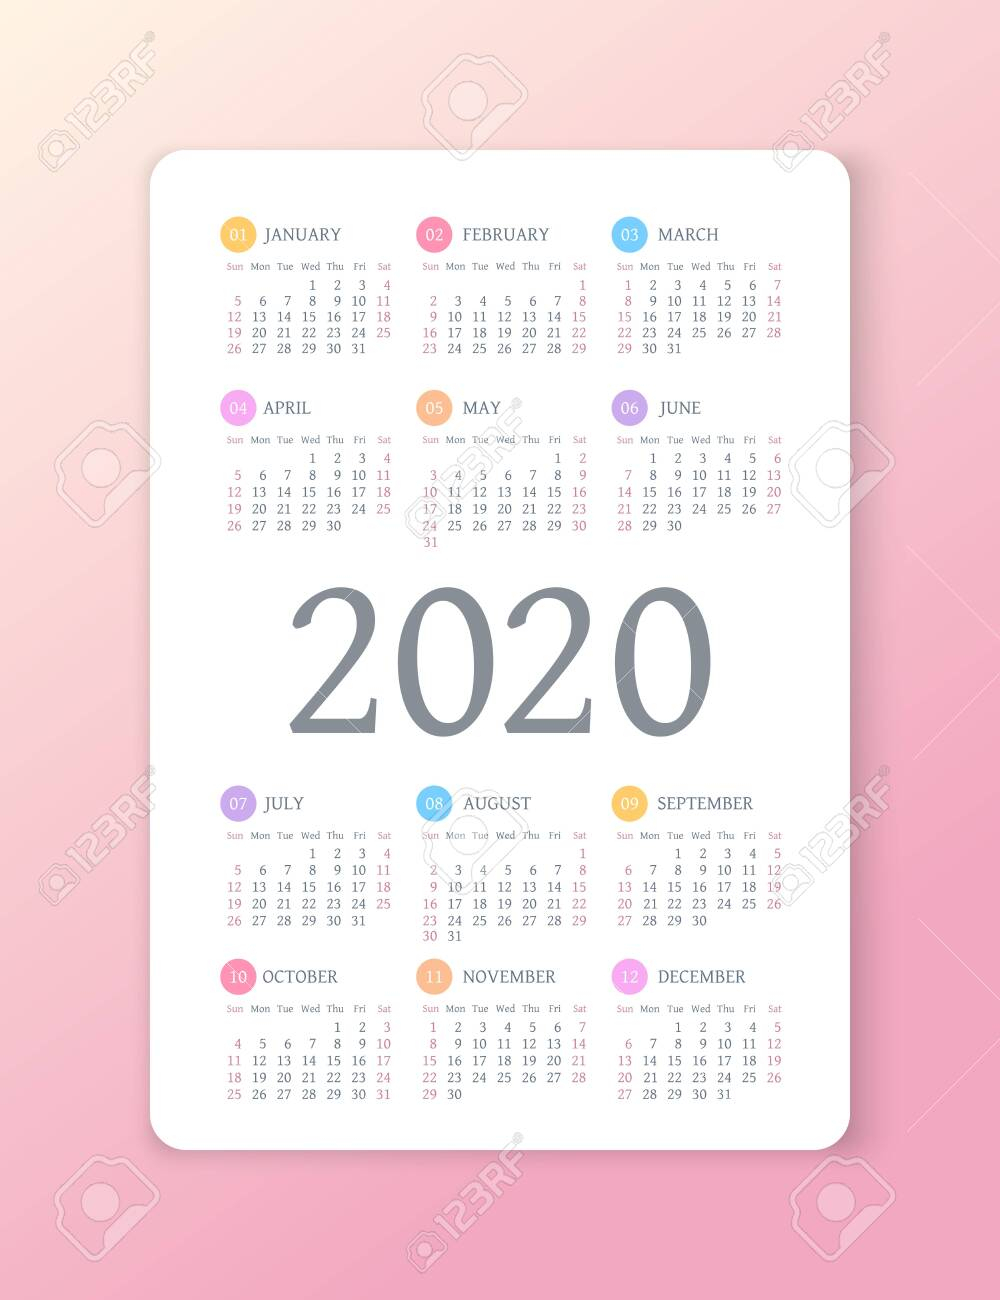 Calendar 2020 Year. Color Vector Template. Week Starts On Sunday